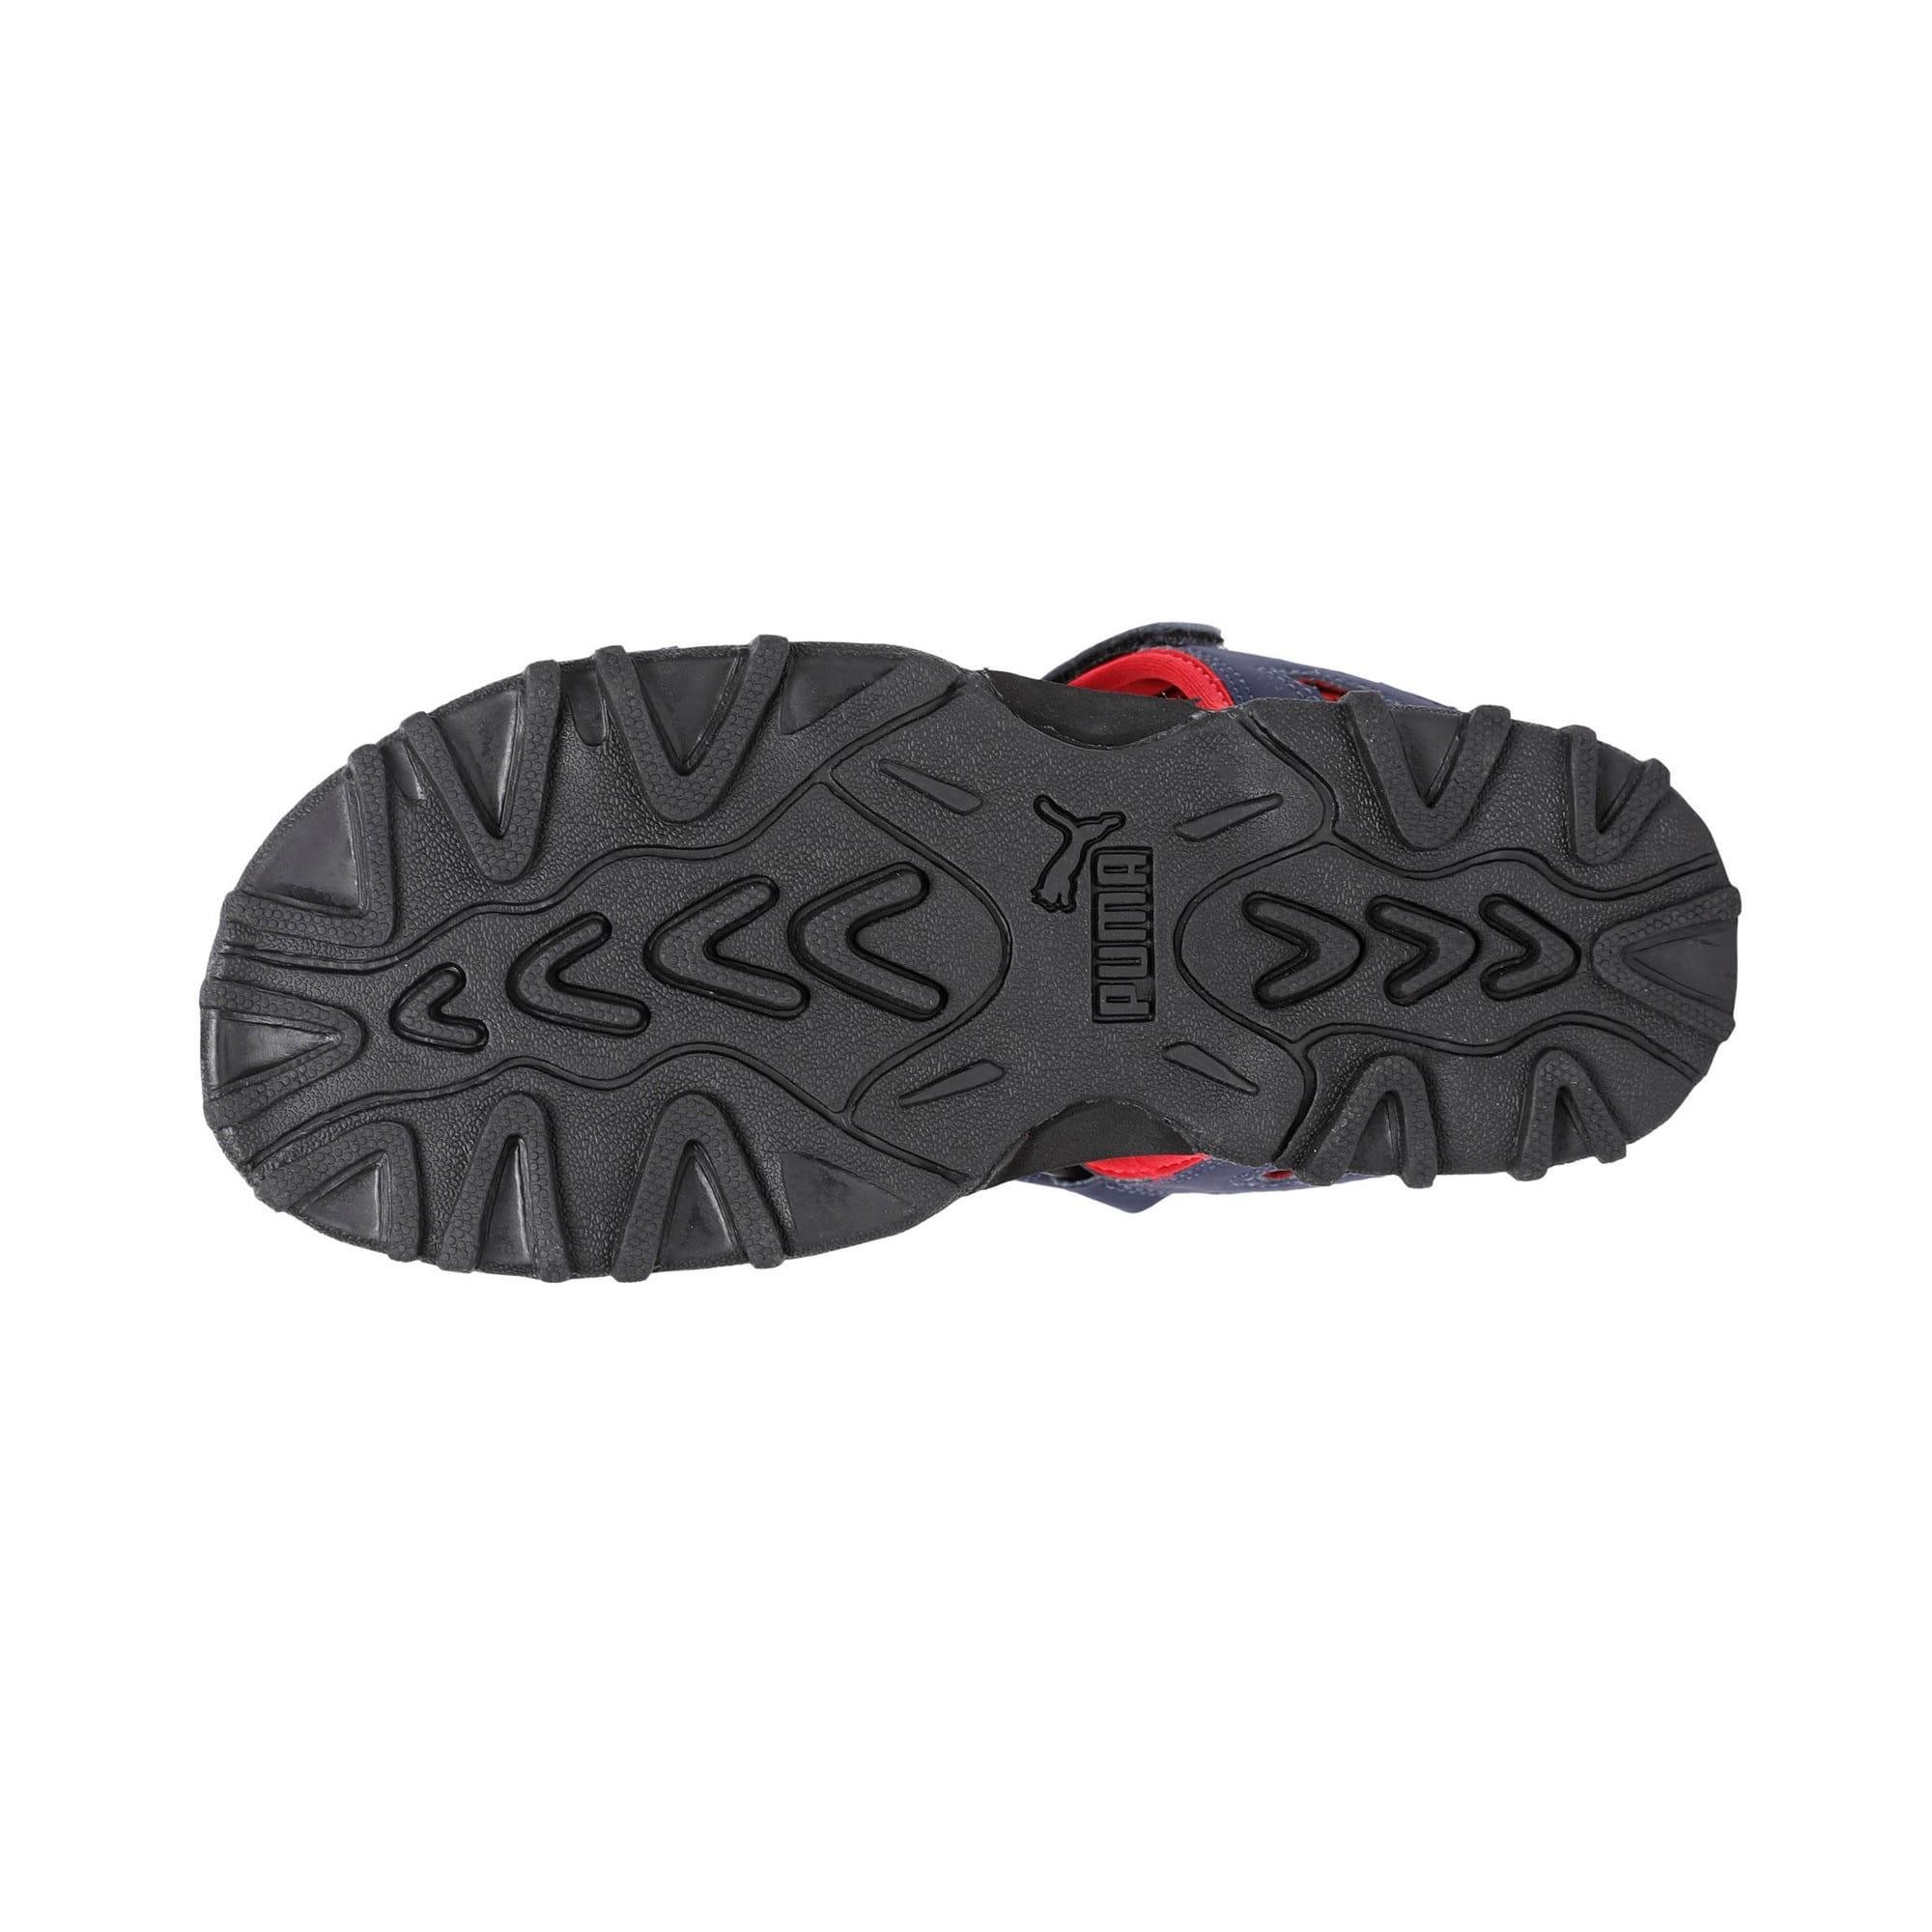 Thumbnail 3 of Track PS IDP, Peacoat-Ribbon Red-Black, medium-IND